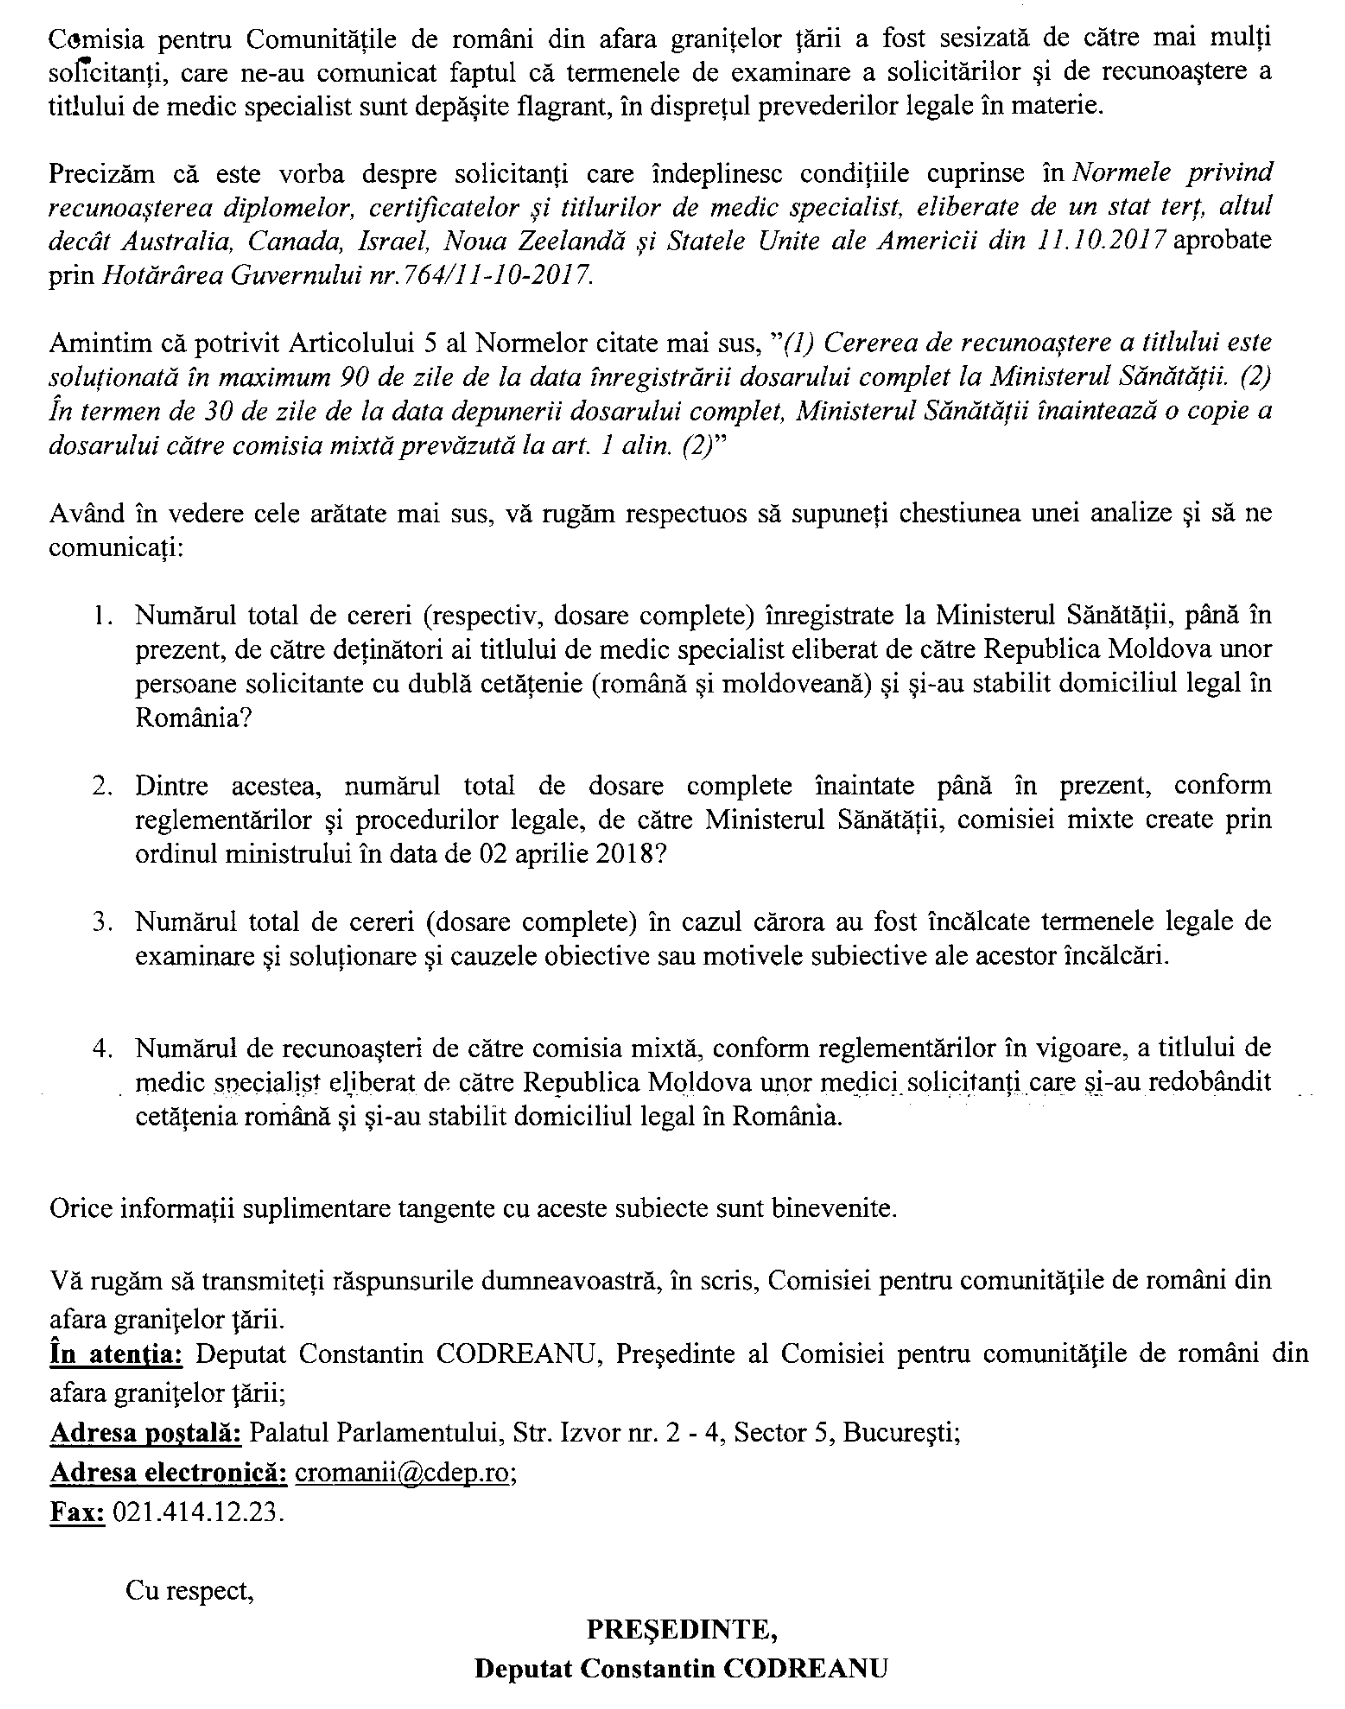 Interpelare Constantin Codreanu Ministerul Sanatatii